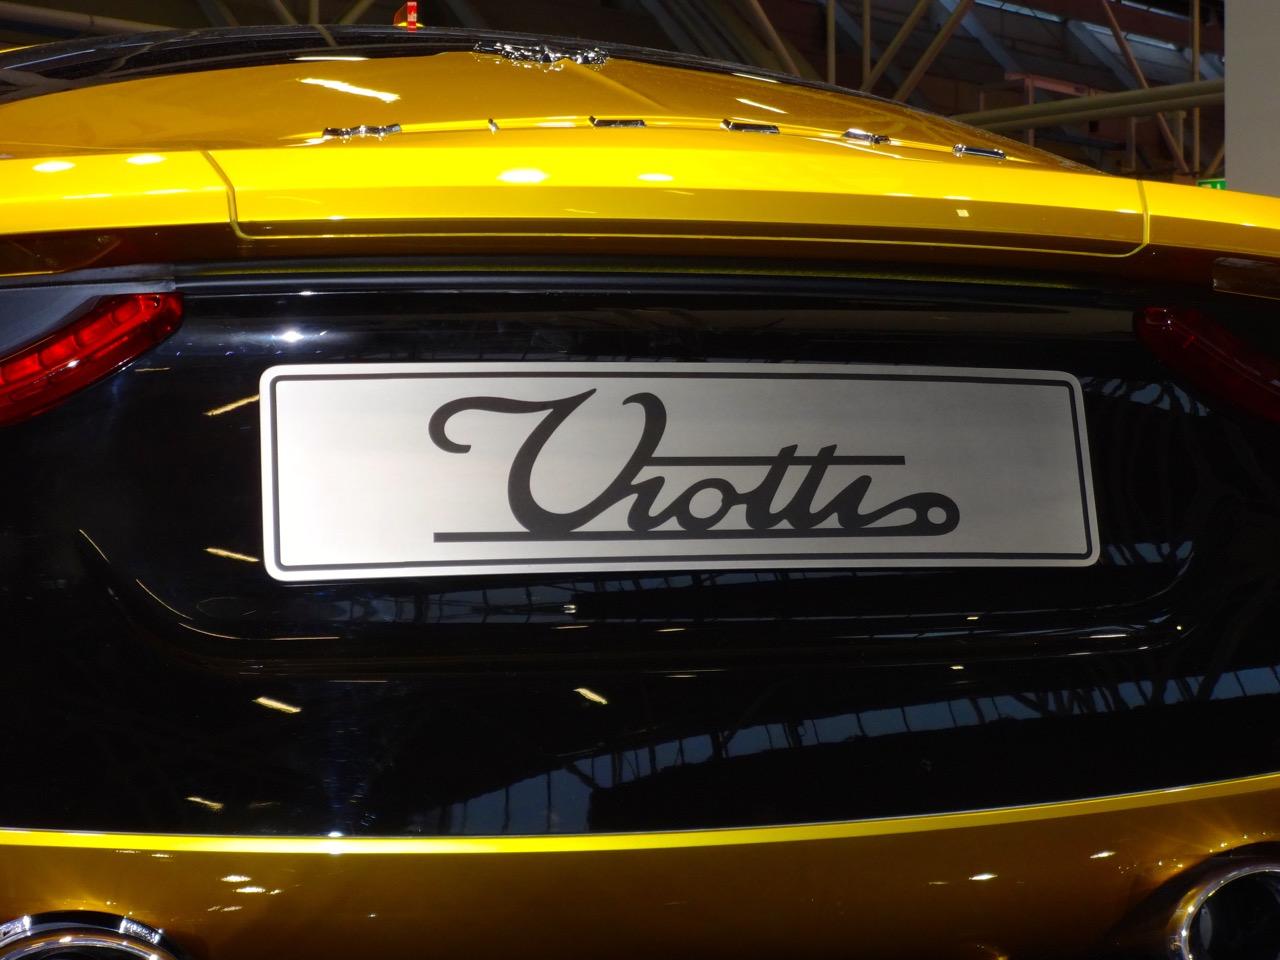 Willys AW 380 Berlineta Viotti - Motor Show 2014